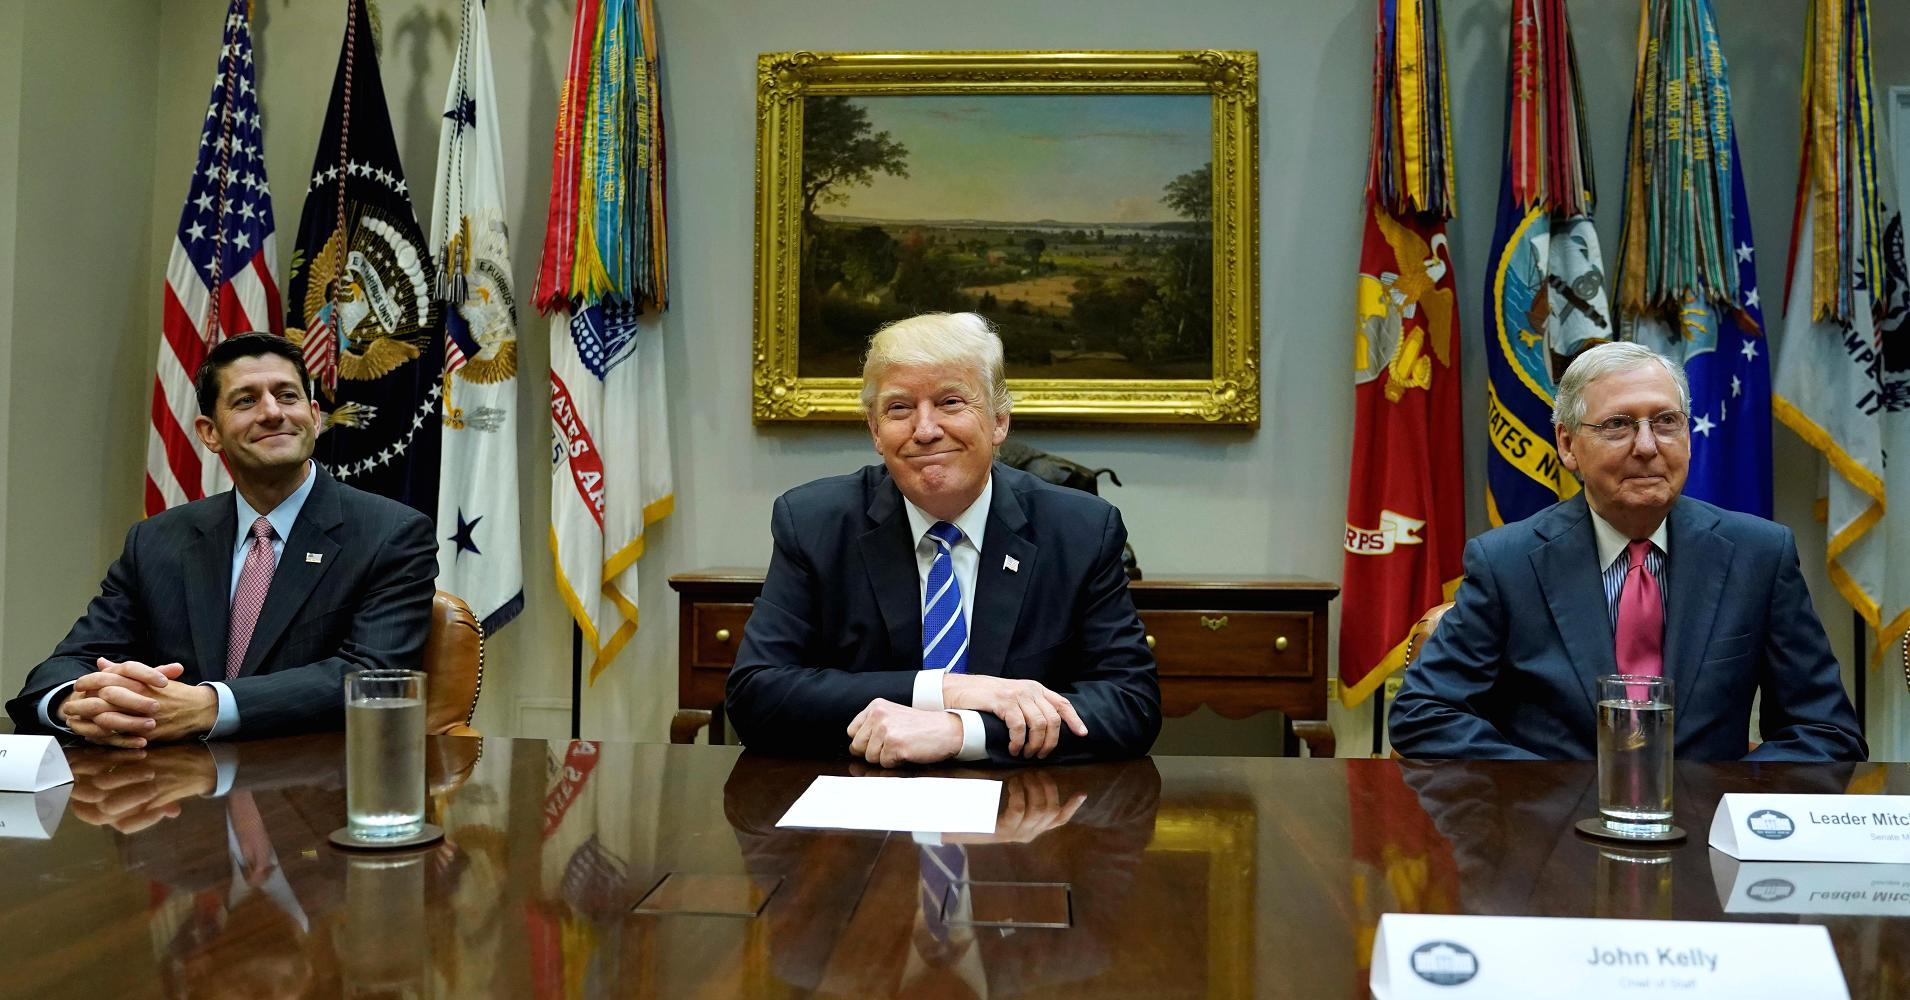 Trump and GOP leaders